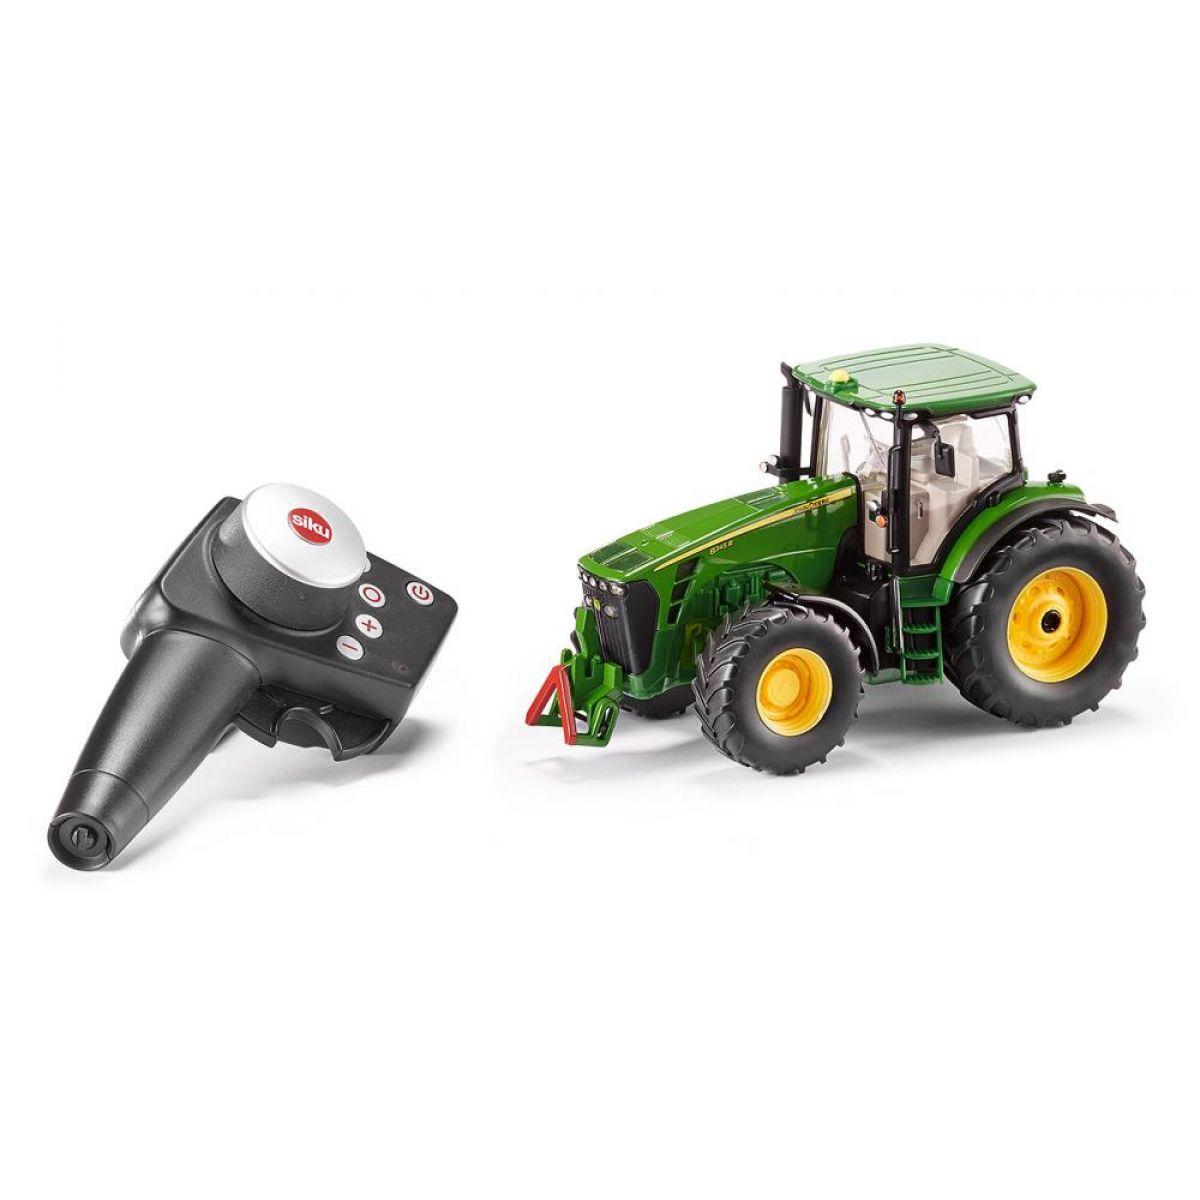 Siku Hračka Control RC traktor John Deere 8345R s dálkovým ovládáním 1:32